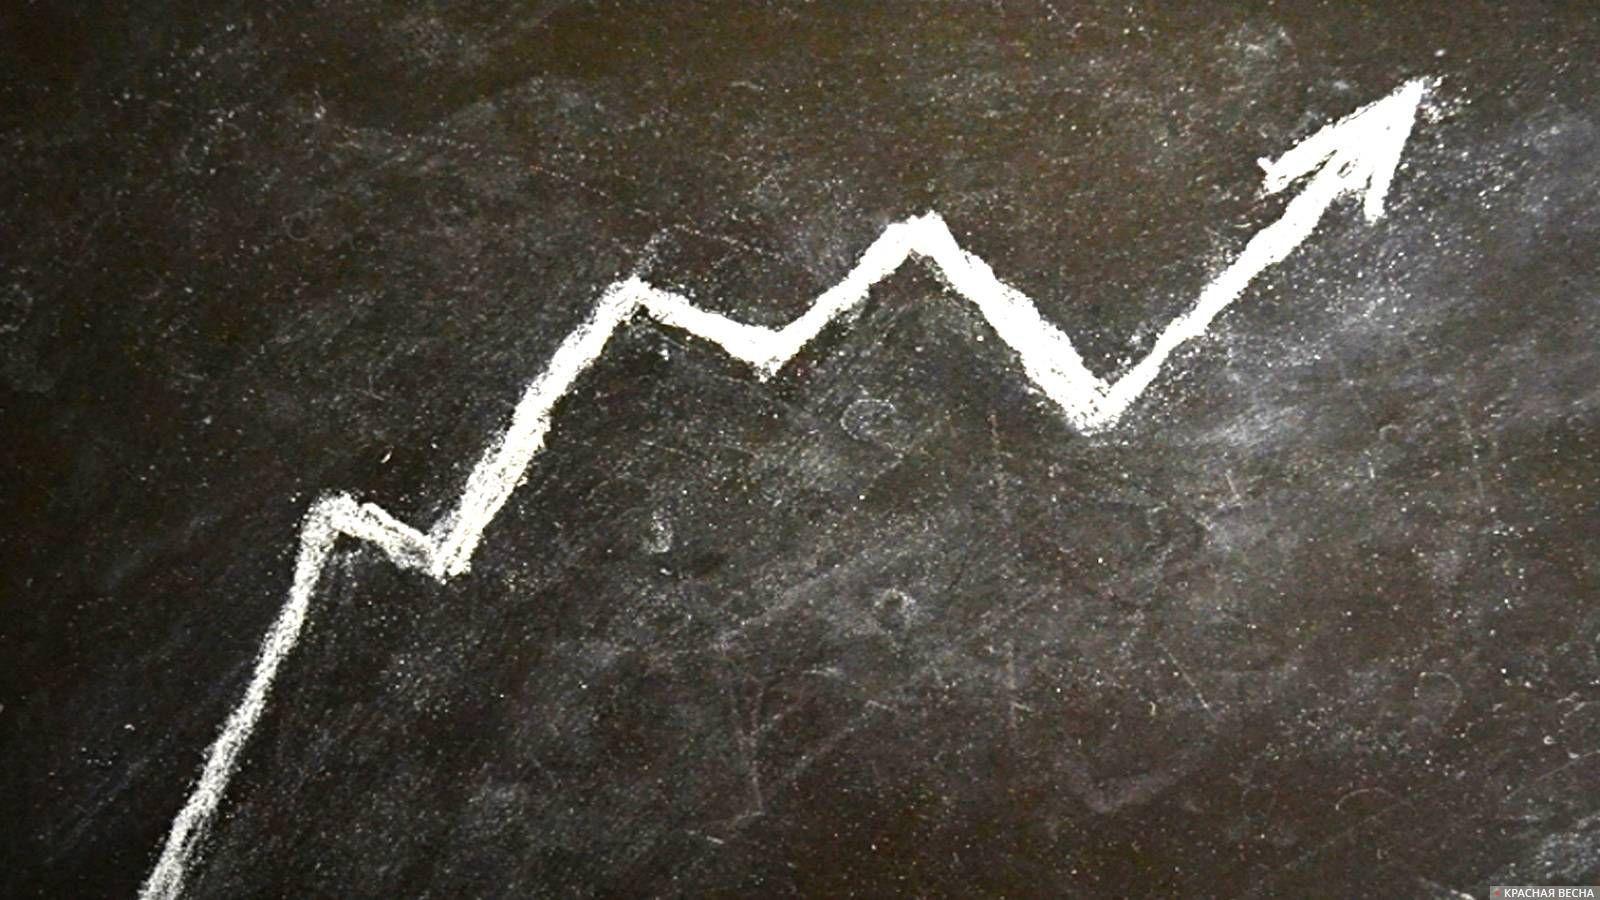 Отток капитала иинвестиции снизились вIкв— ЦБРФ